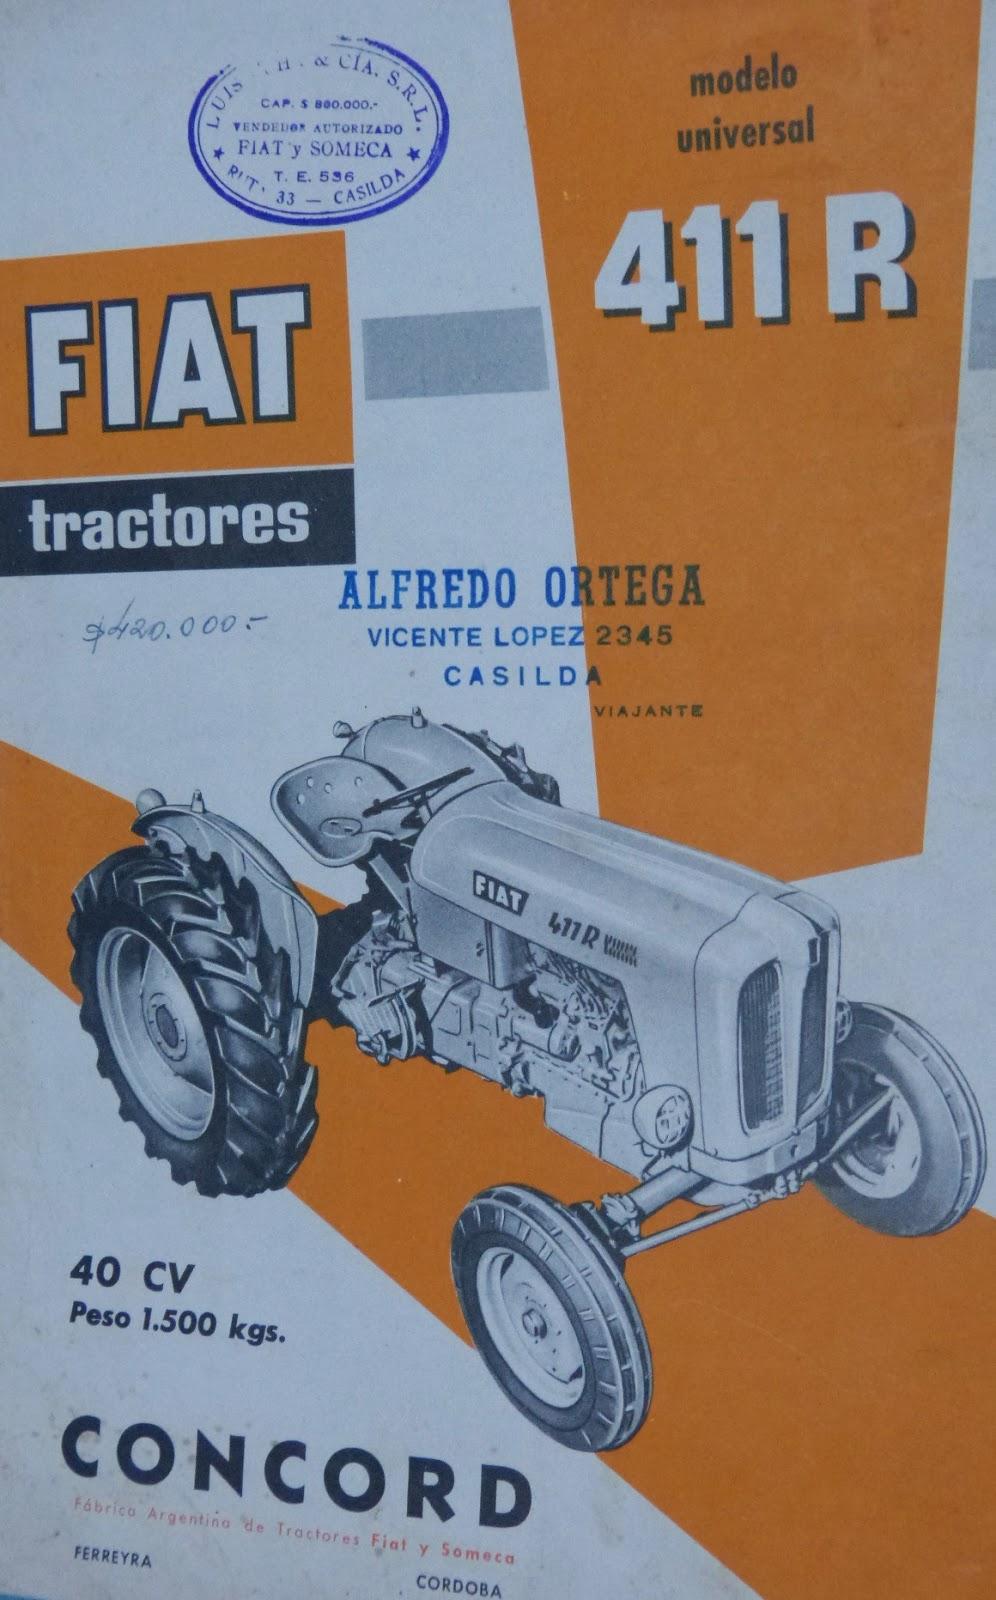 ... Array - fiat concord 411r tractor u0026 construction plant wiki fandom  rh tractors ...